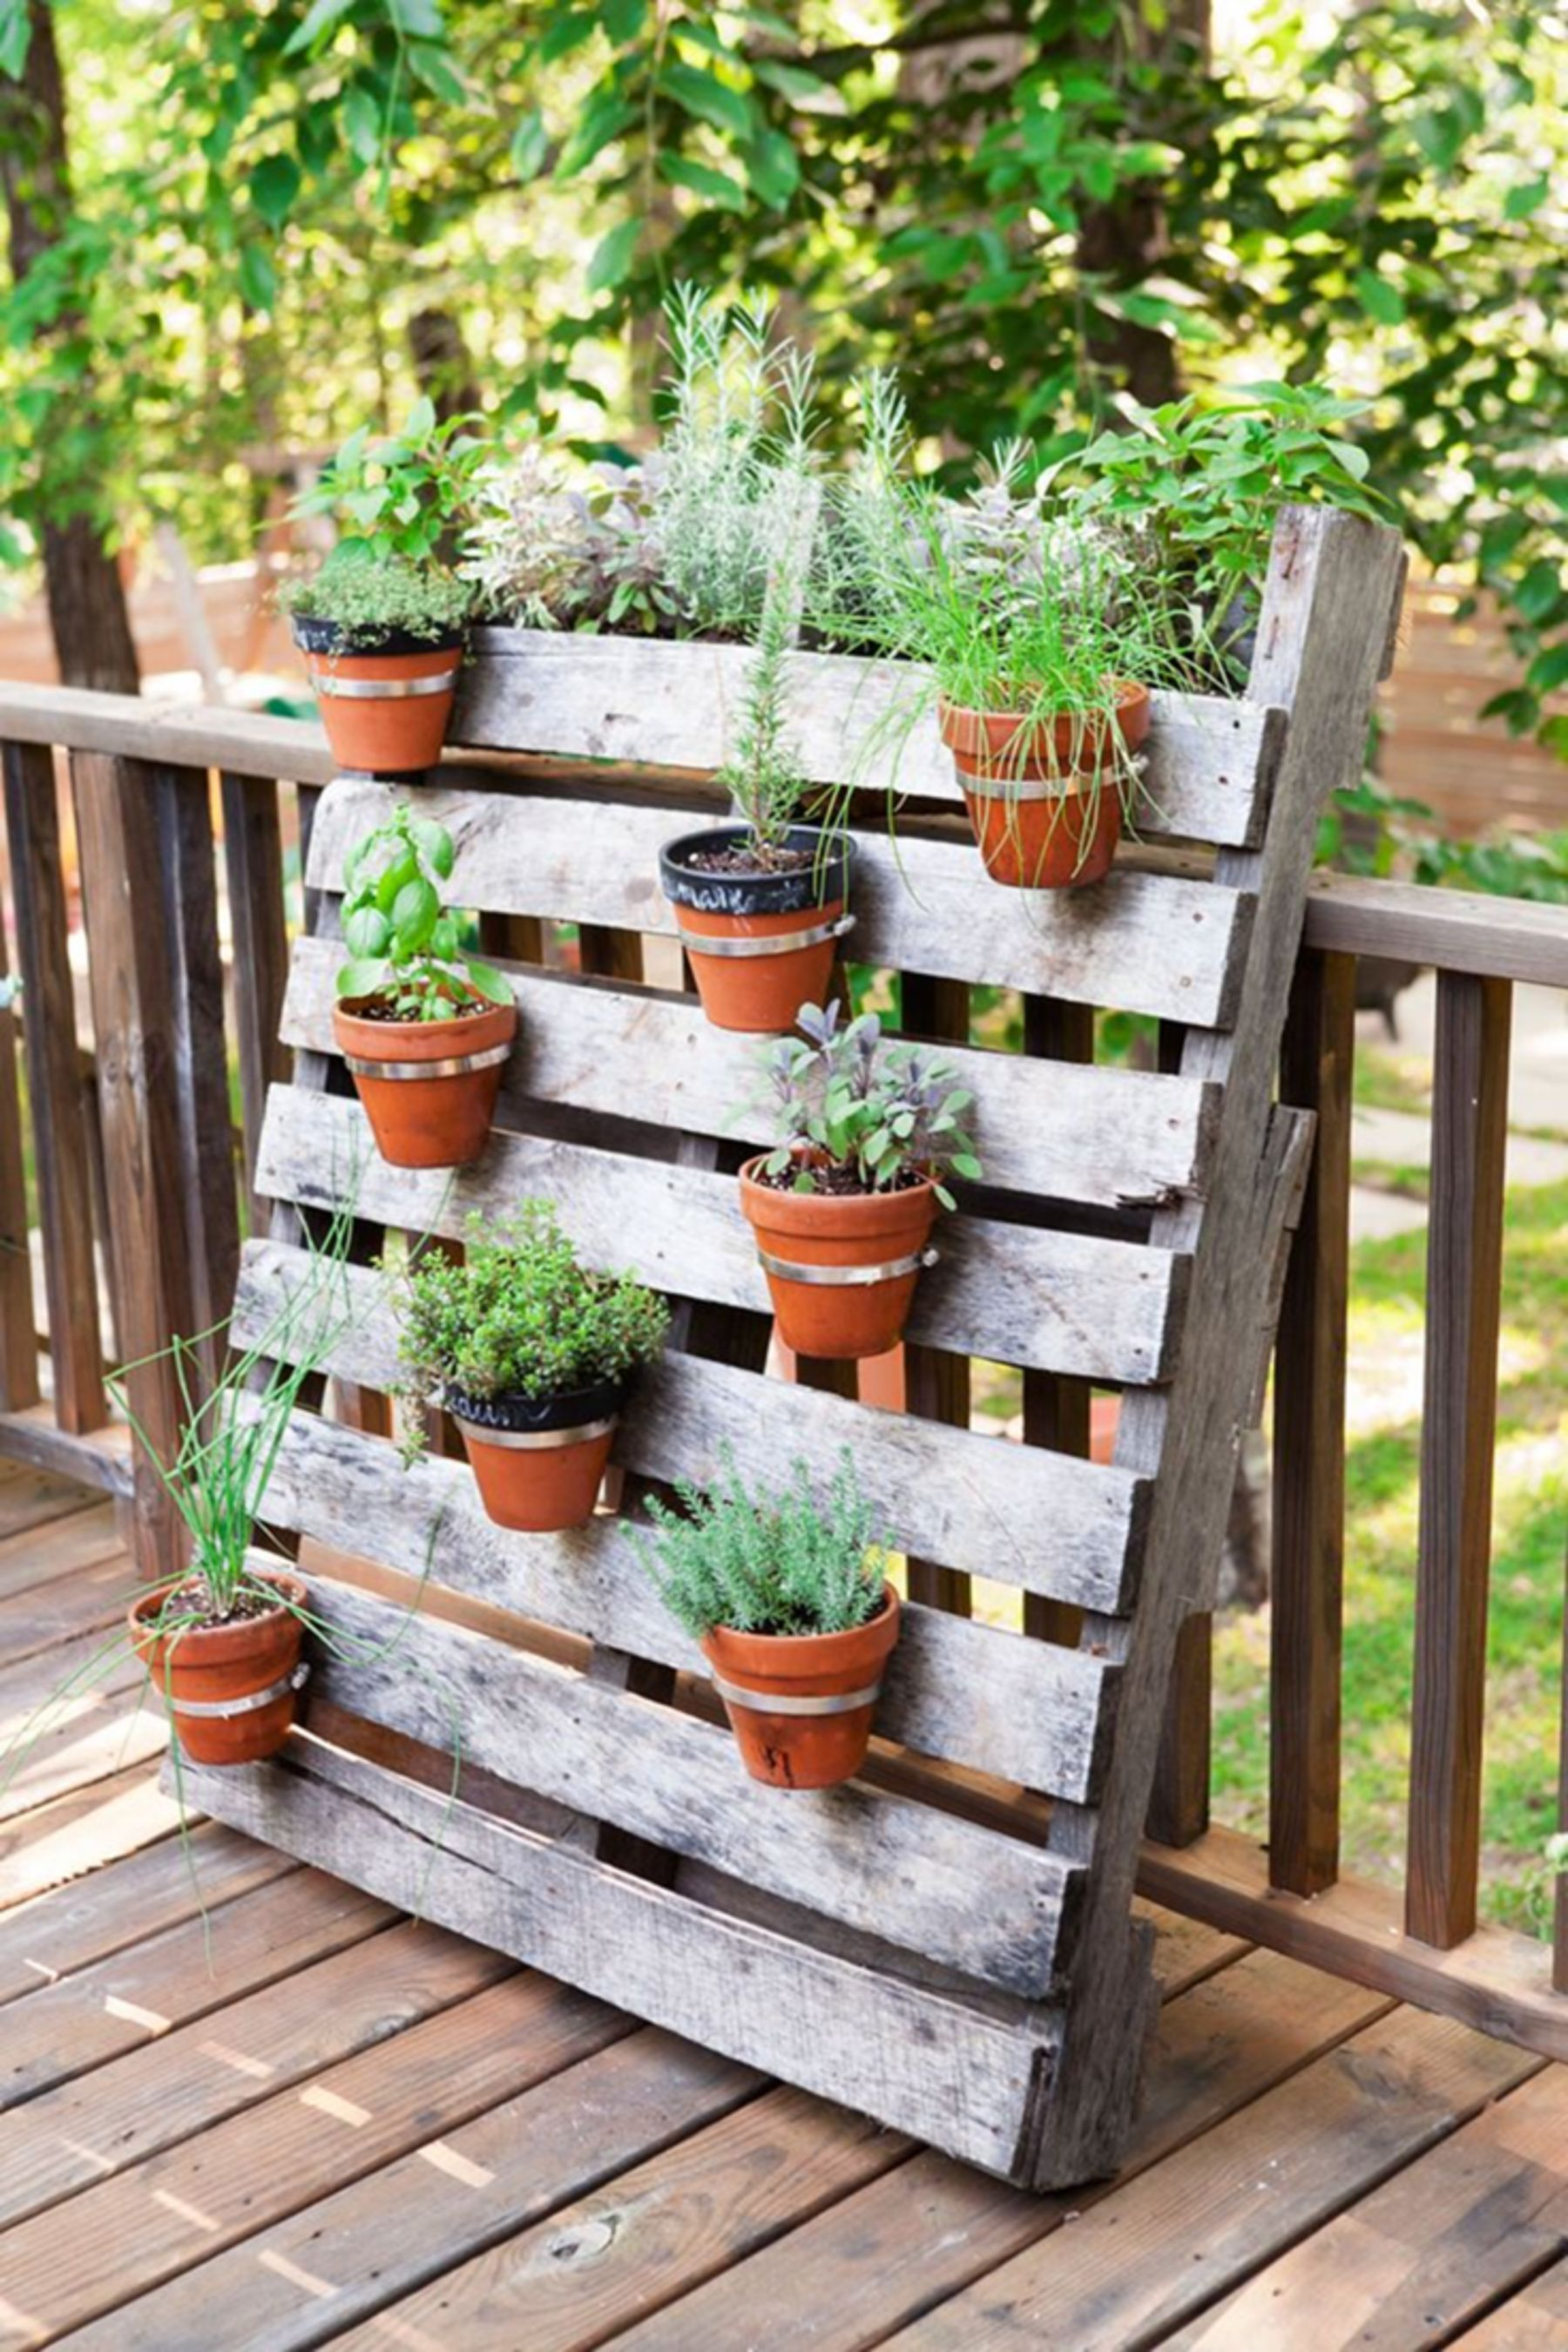 Marvelous 10 Best Cheap Diy Spring Garden Ideas That Will Make Your Home Outdoor Amaze Https Hroomy Com Plants Diy Herb Garden Diy Garden Herb Garden Design